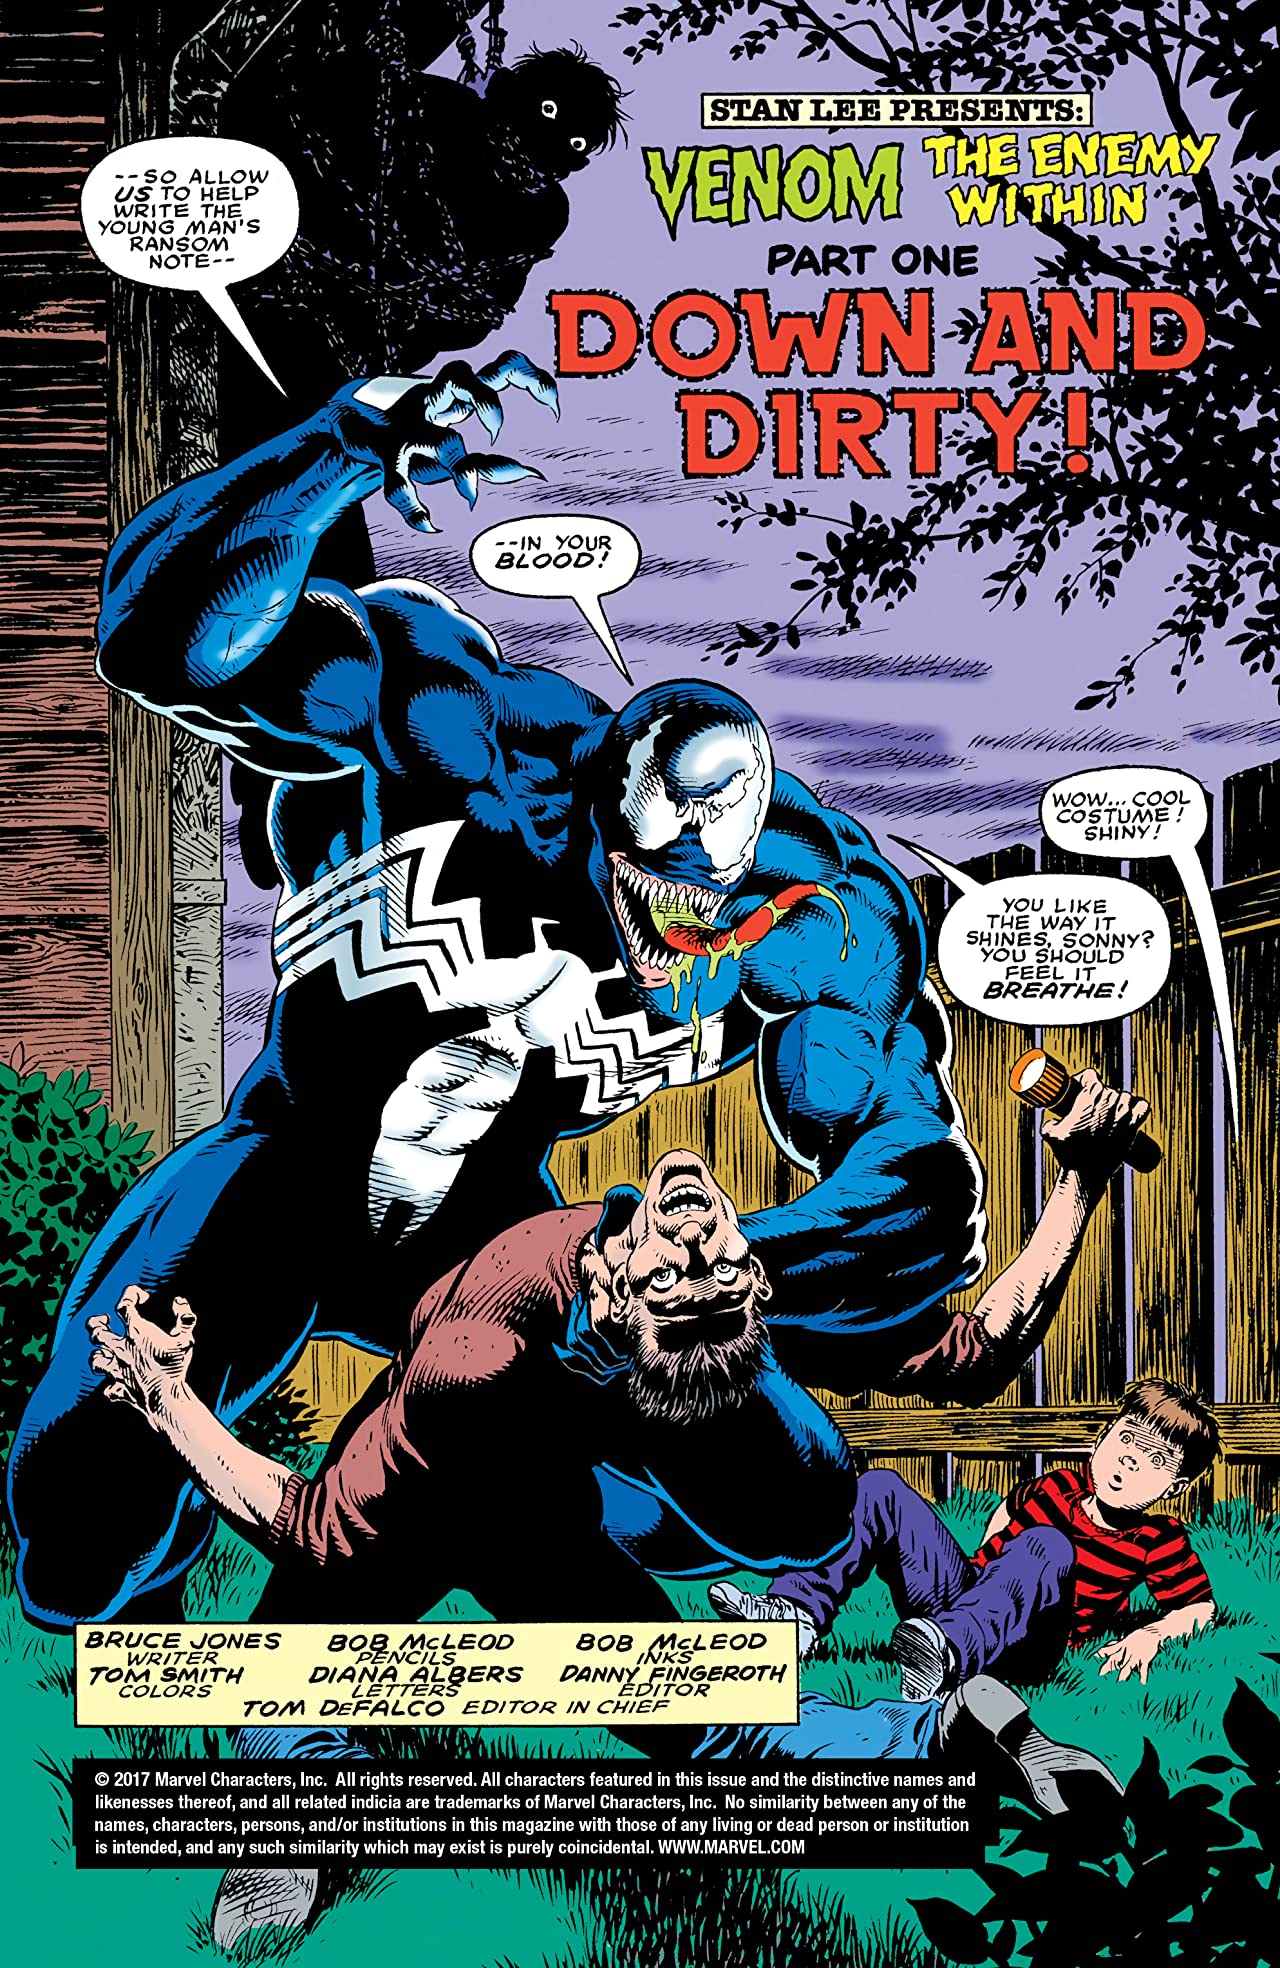 Venom: The Enemy Within (1994) #1 (of 3)